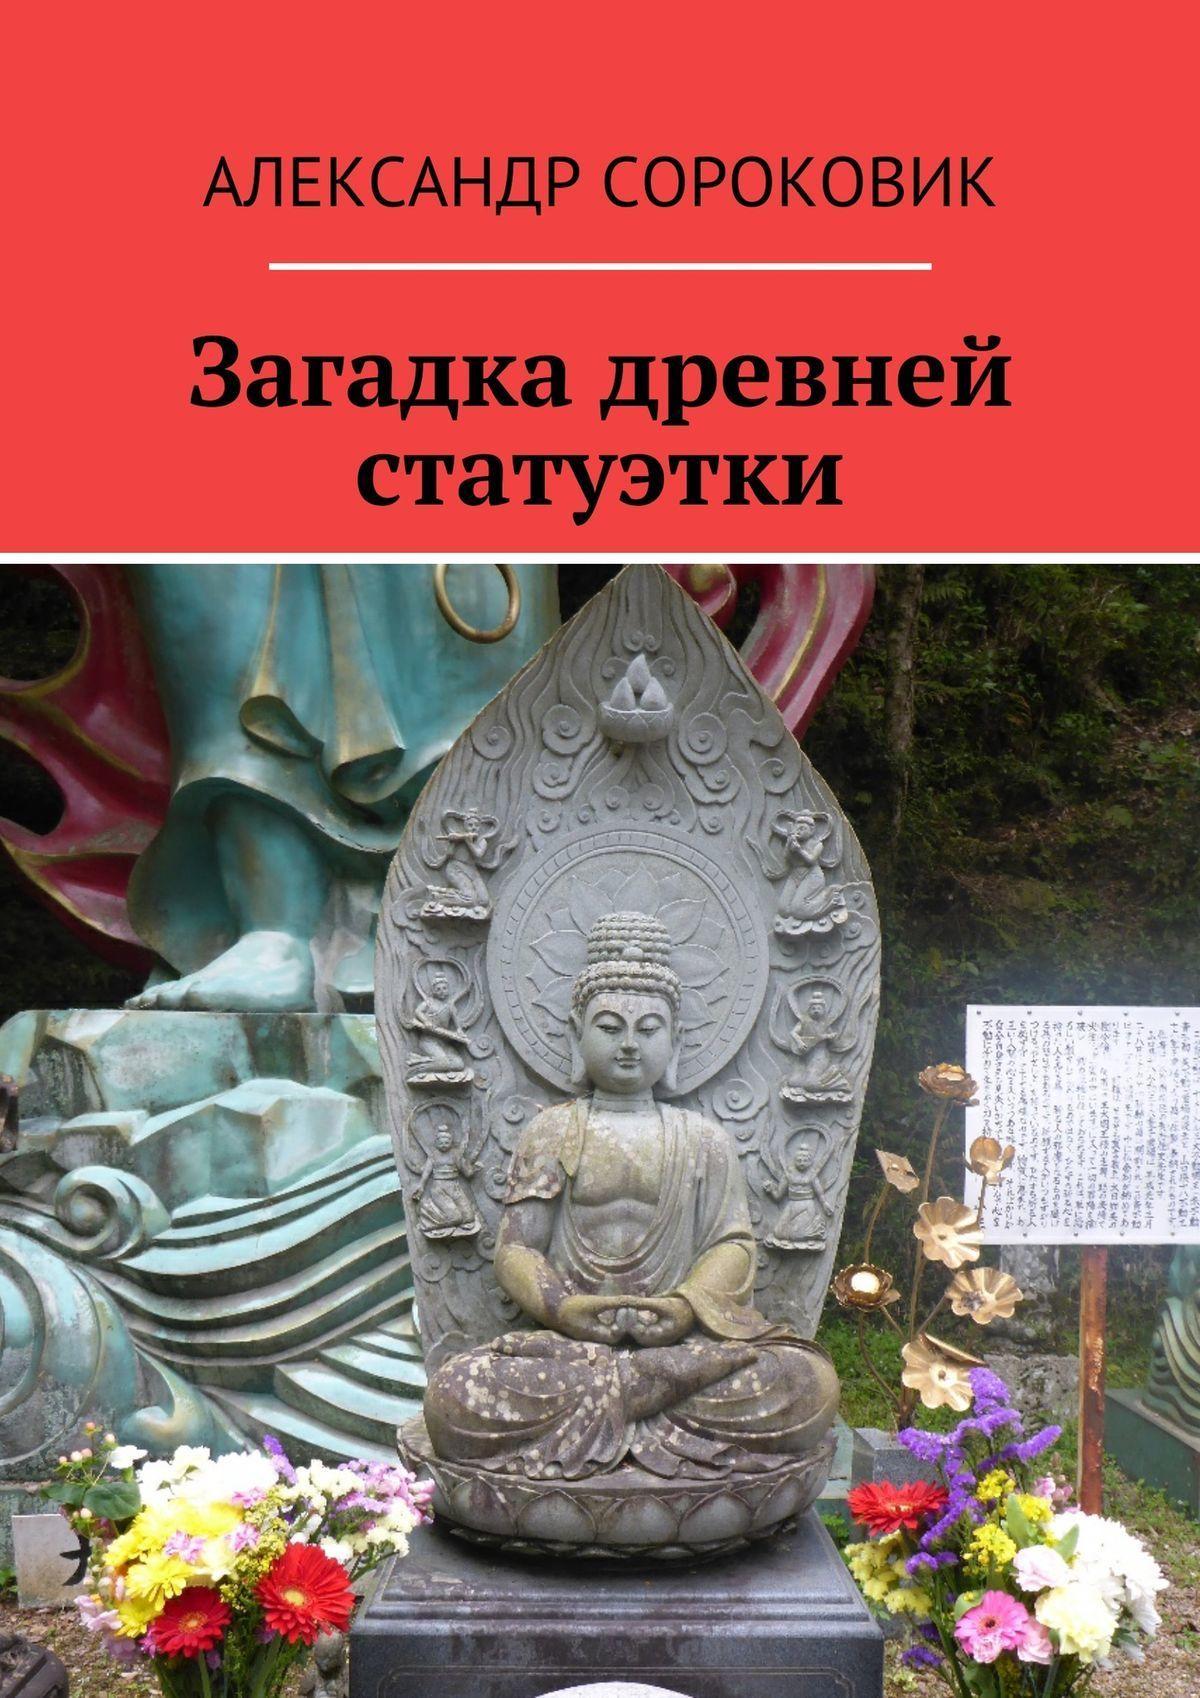 Александр Сороковик Загадка древней статуэтки prostotoys статуэтки фигурки